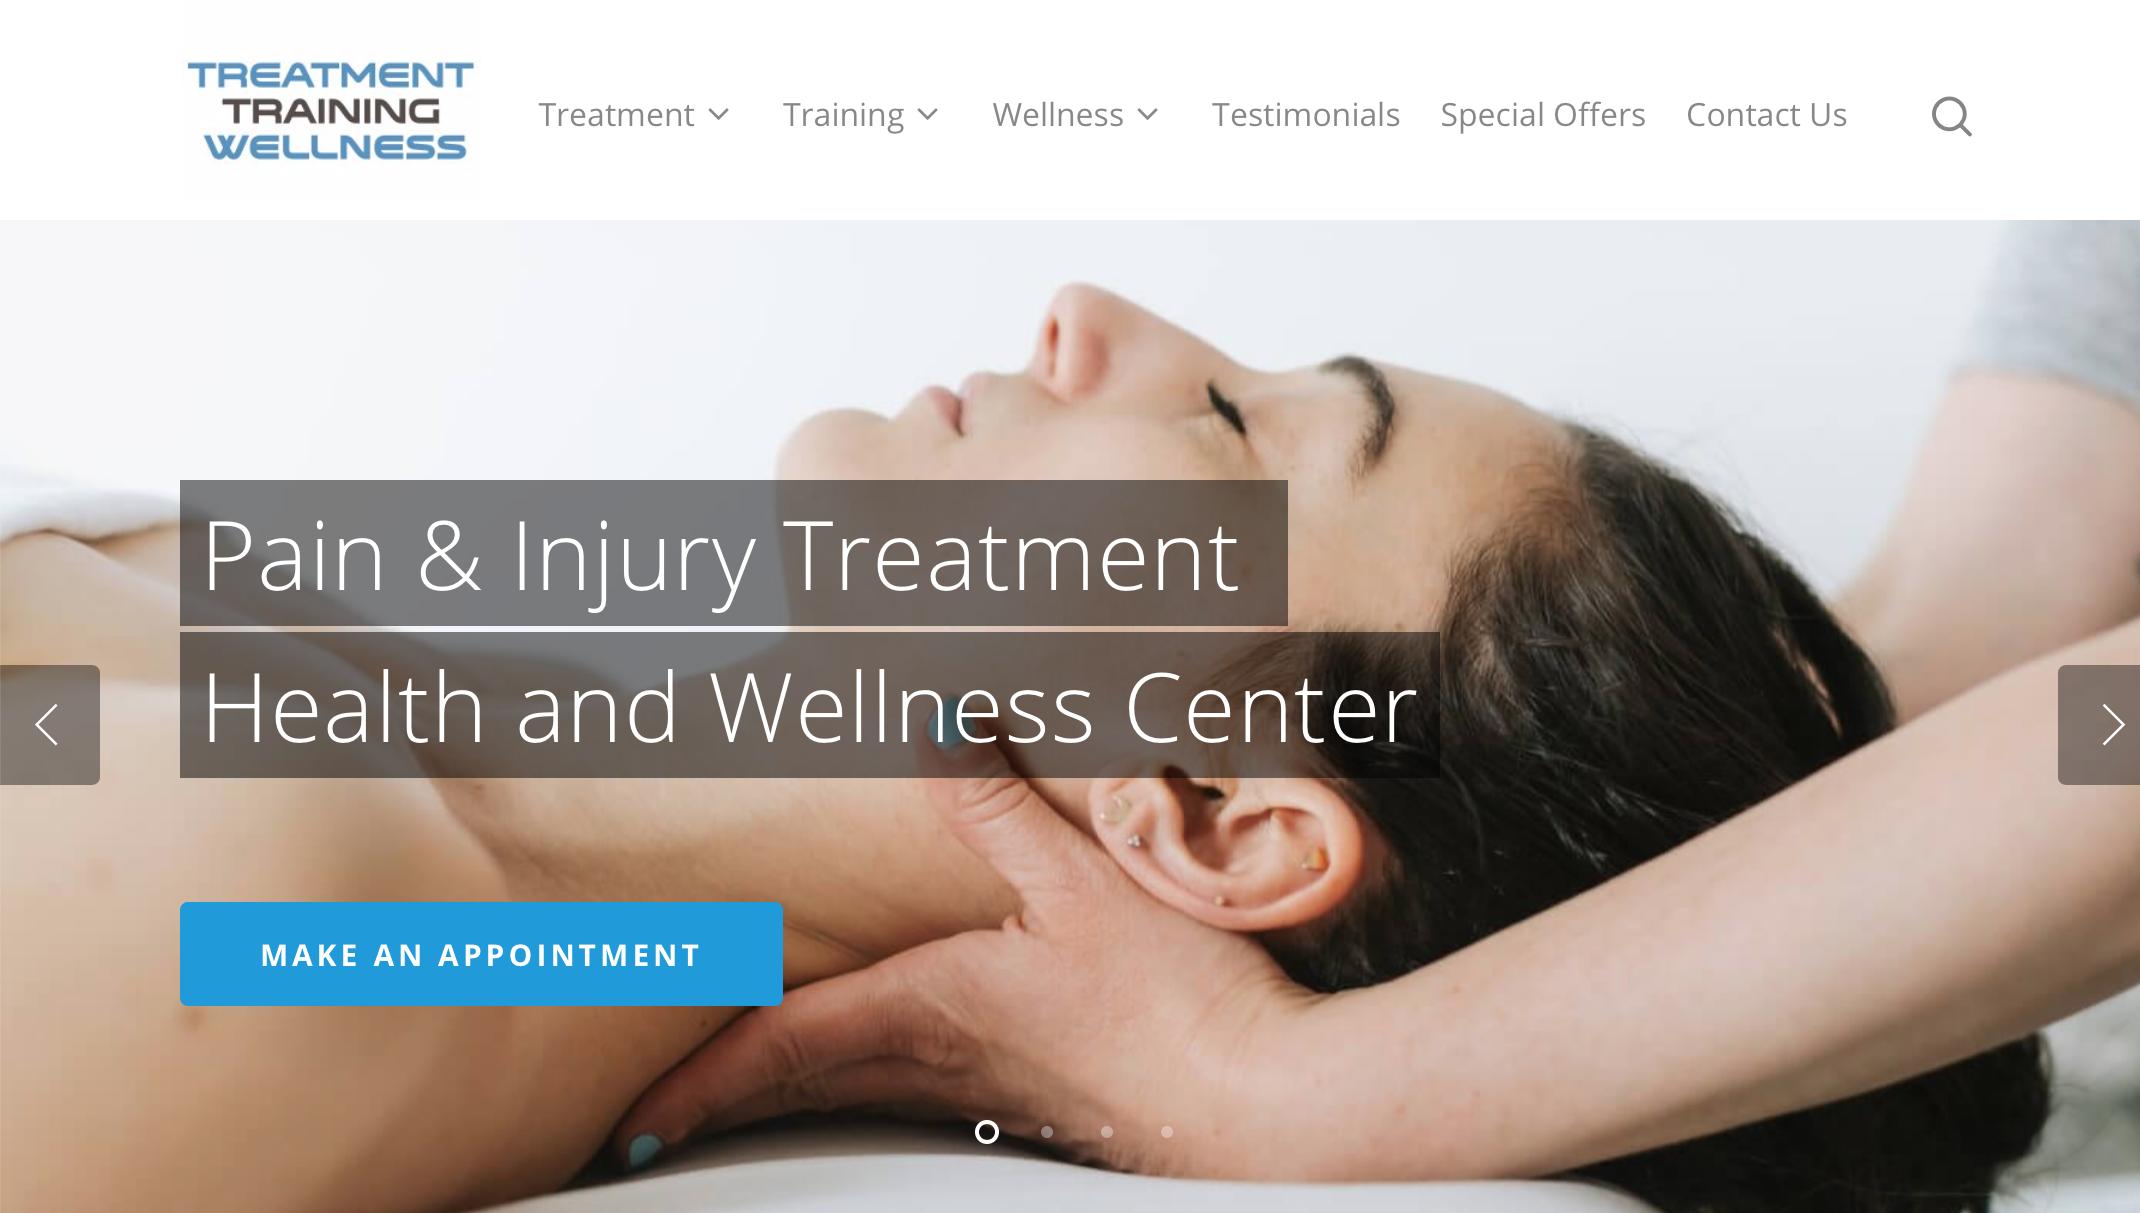 treatment-training-wellness-ttw-boston-2.png